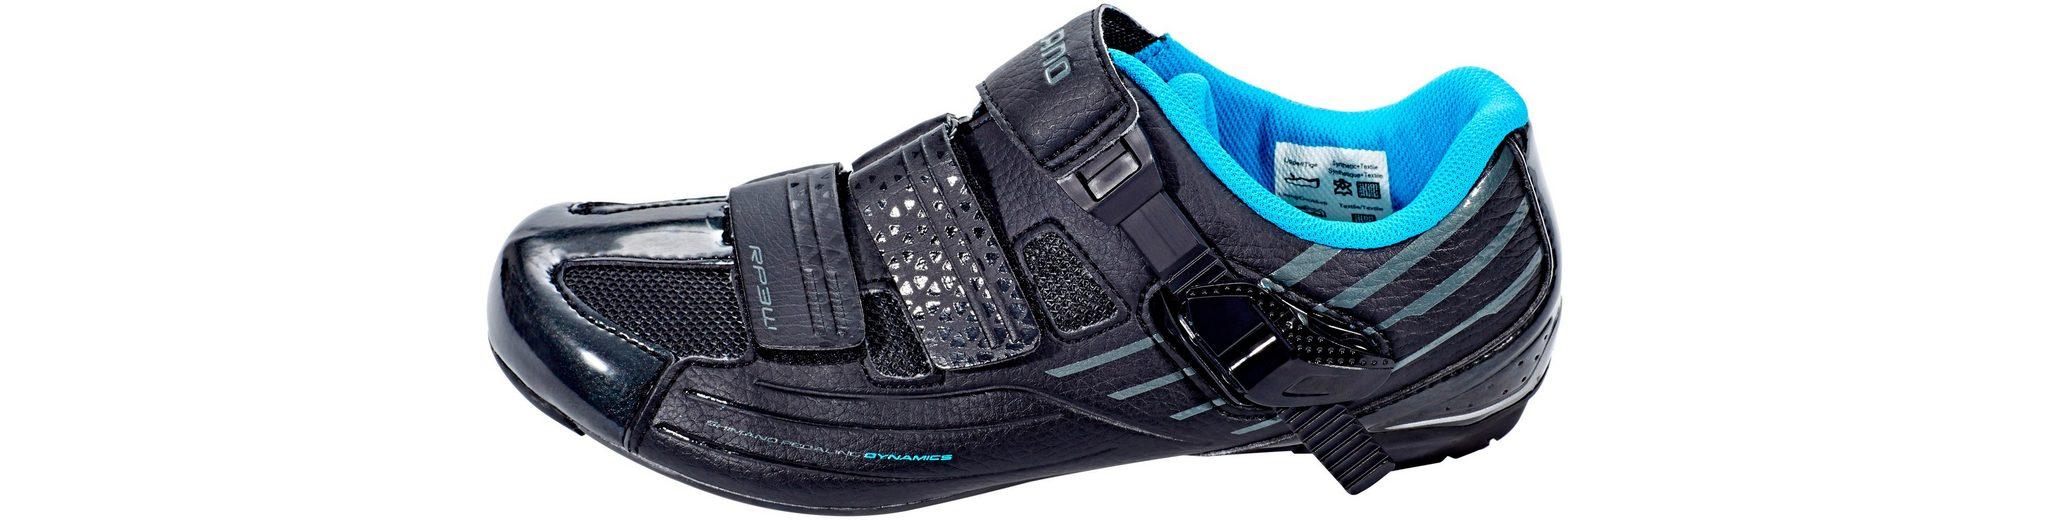 Shimano Fahrradschuh SH-RP3L Schuhe Damen Rabatt Gutes Verkauf YM2xN3XHV